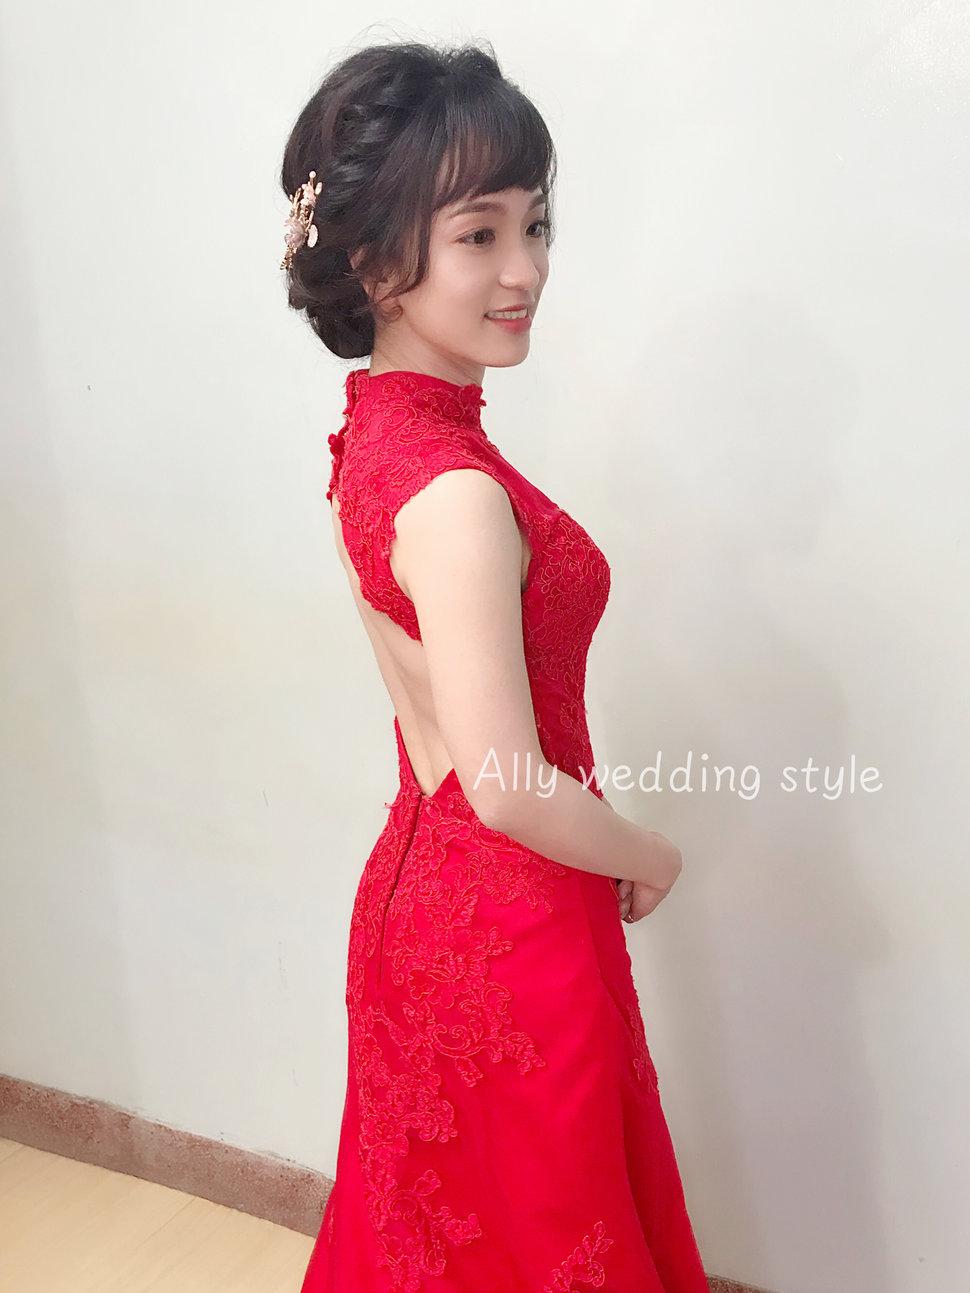 9A329306-17FA-41B1-B161-C7D30DFC53DF - 台中高雄新娘秘書Ally Chen《結婚吧》